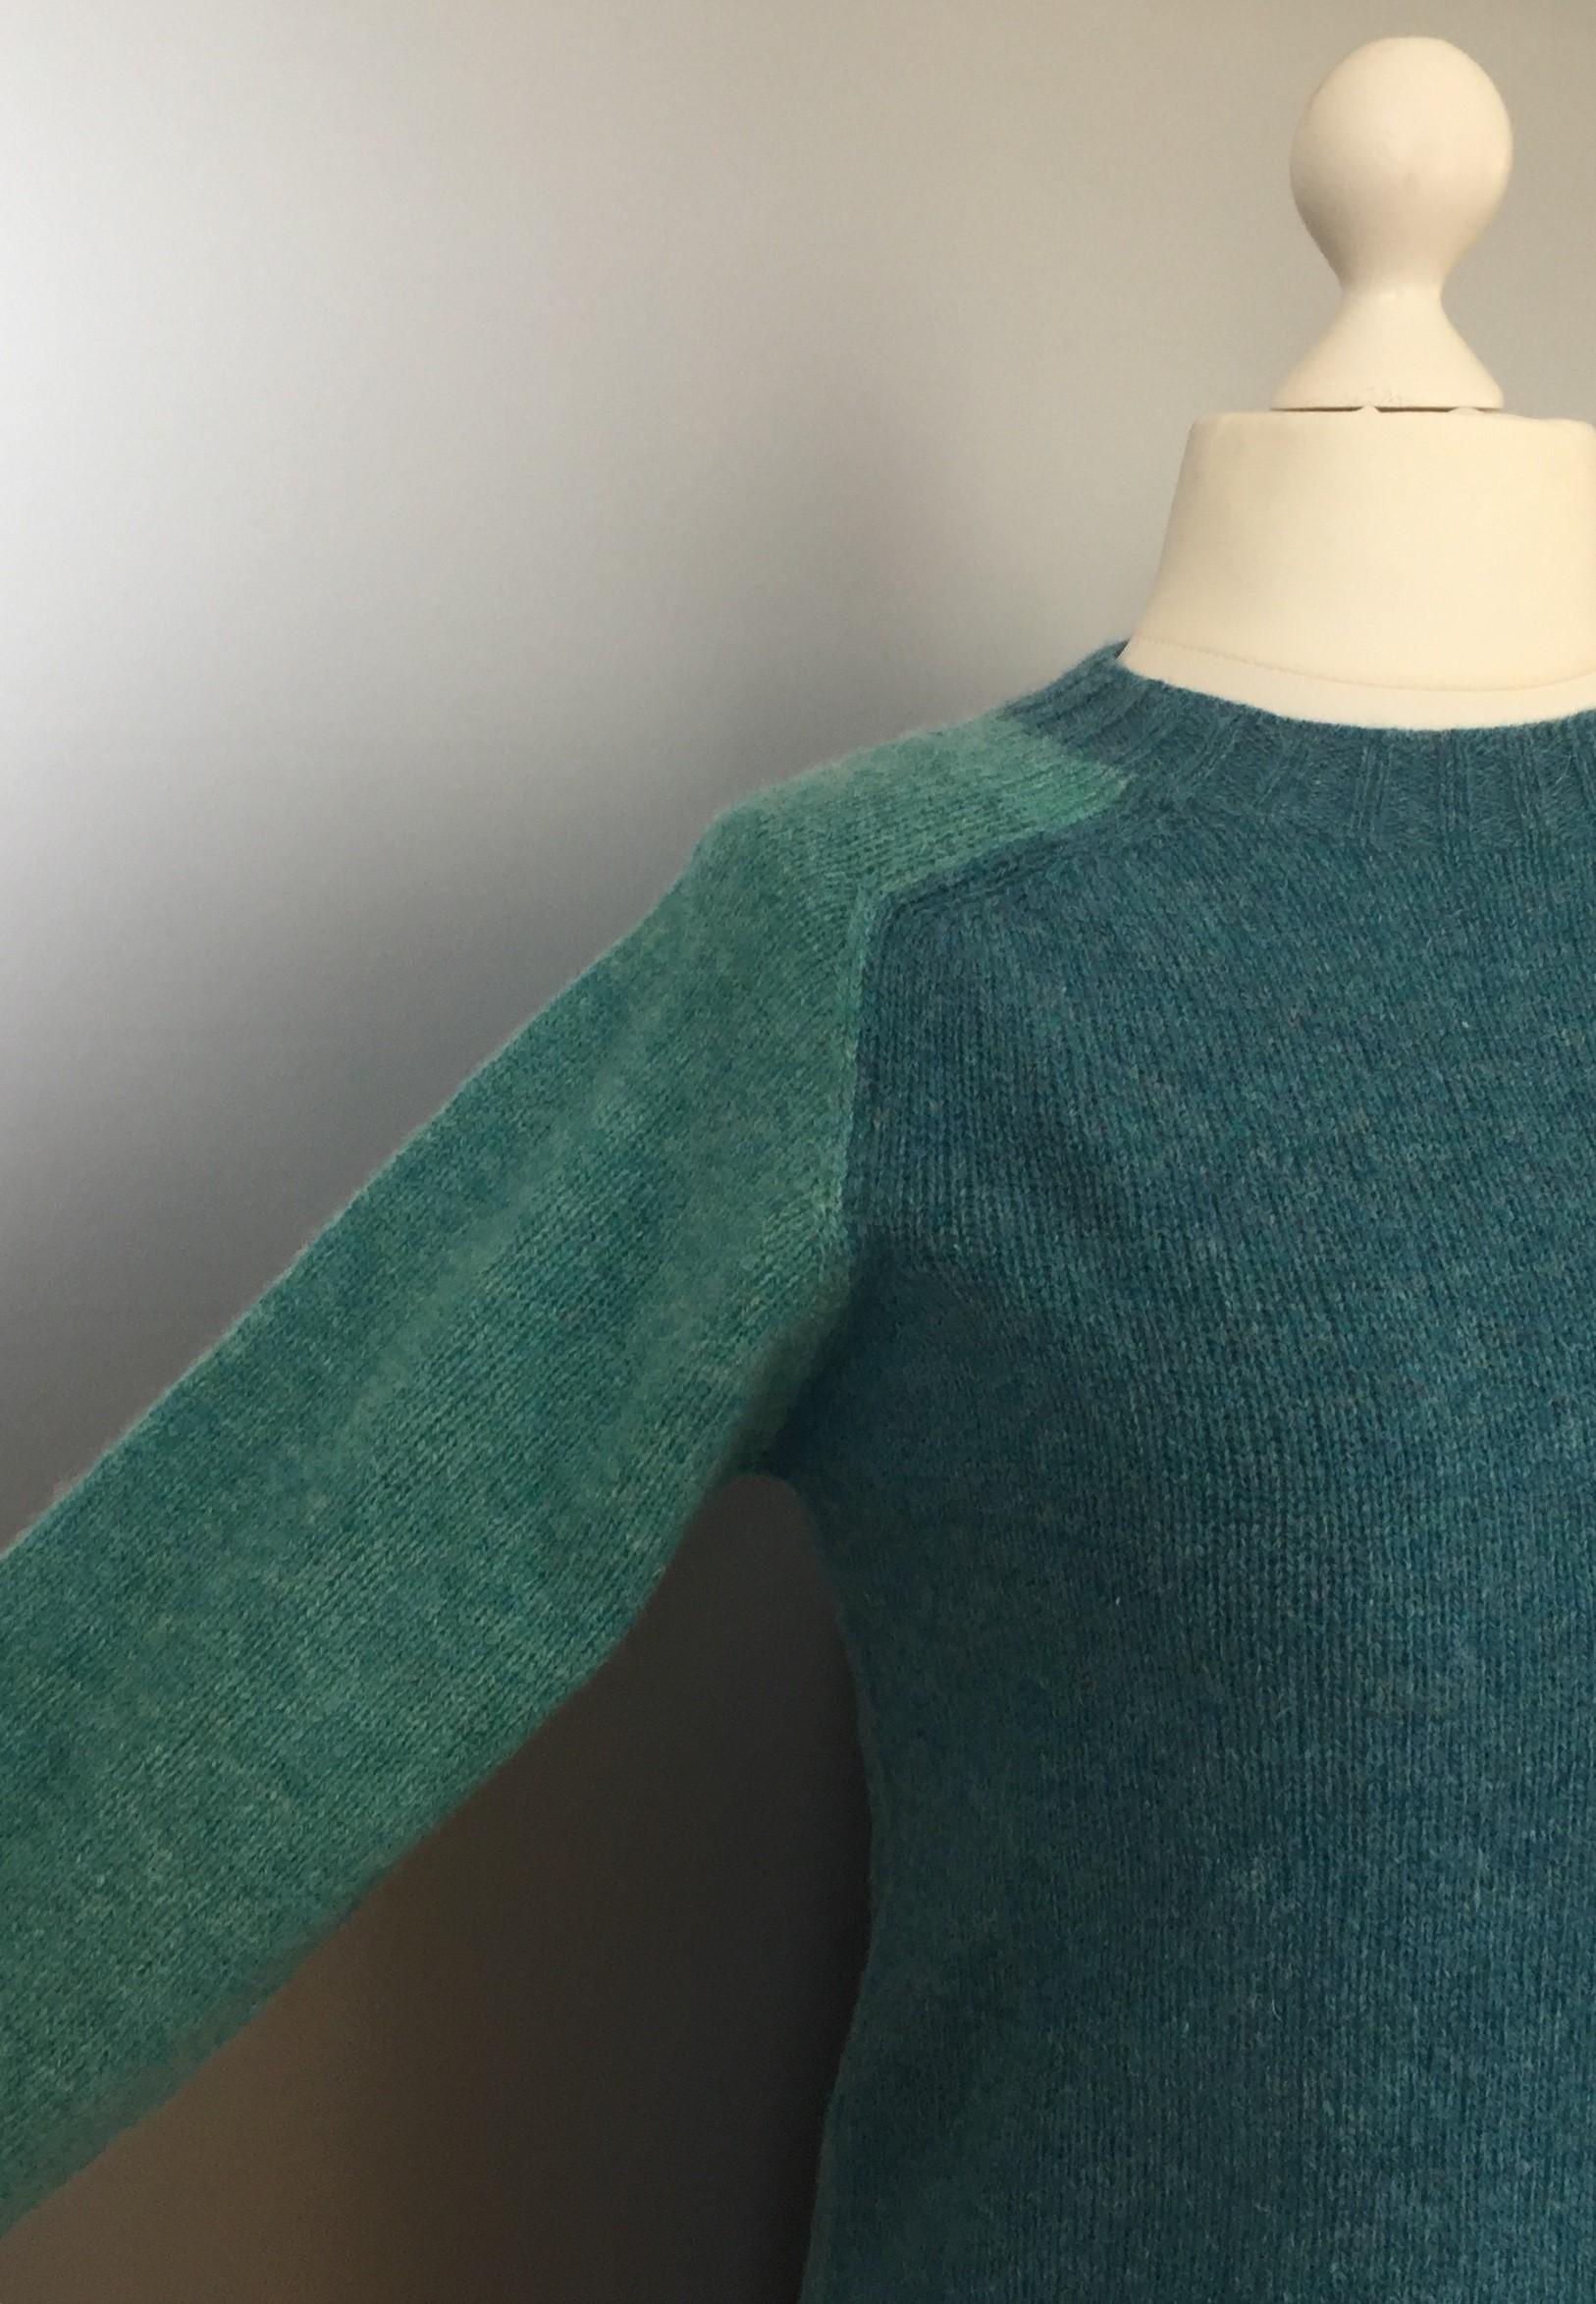 Harley of Scotland - Unisex Uld Pullover - tofarvet, turkis, blå, blågrøn, sporty, herremodel, herrestrik, herresweater, uldtrøje, uldpullover, pullover, striktrøje, strik, trøje, let, lun, tynd, lang, damestrik, biti, speciel, skotsk